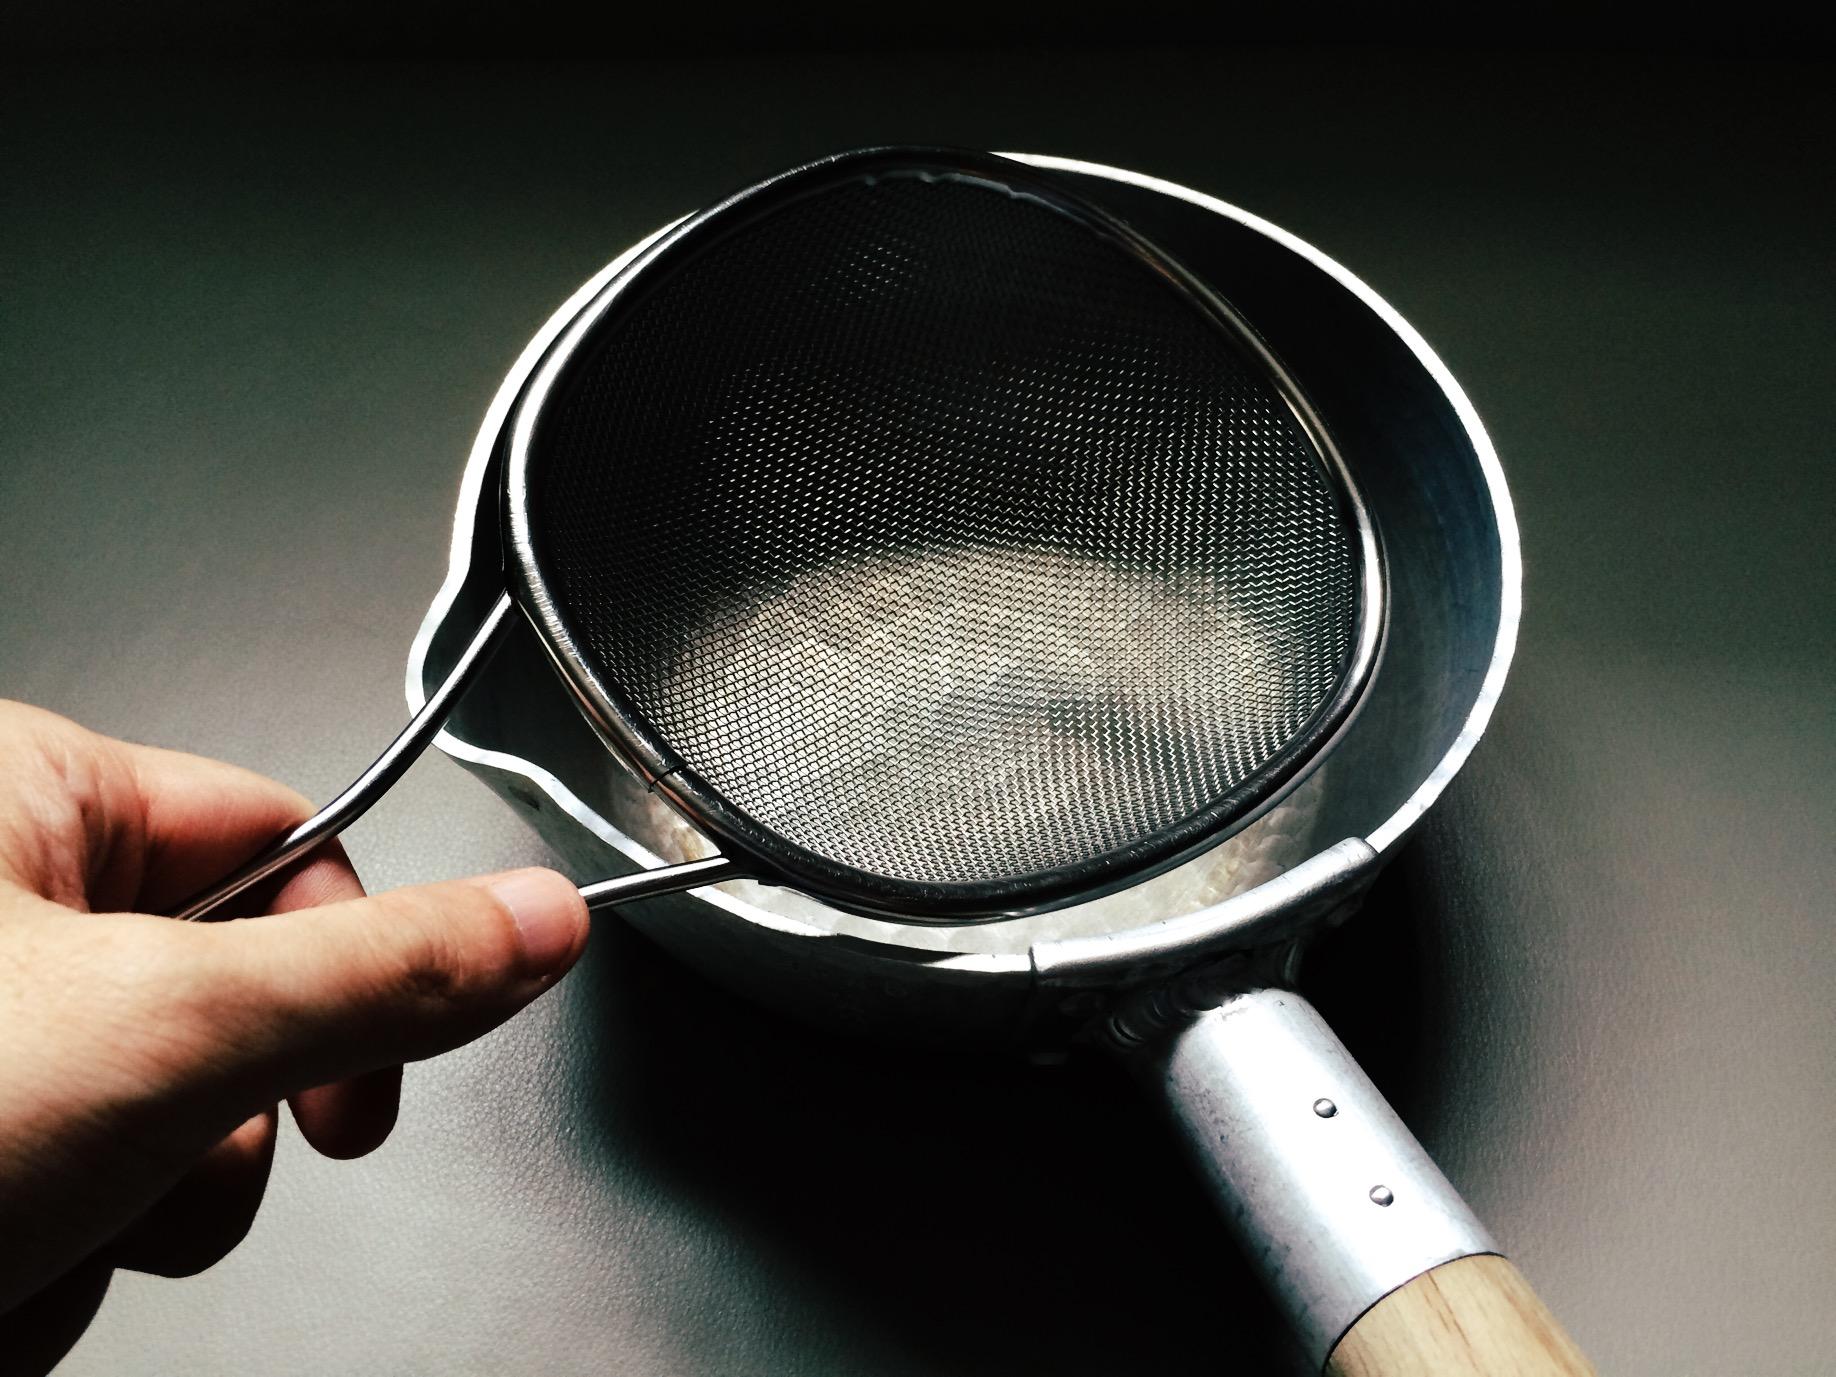 大撈杓in 18公分雪平鍋